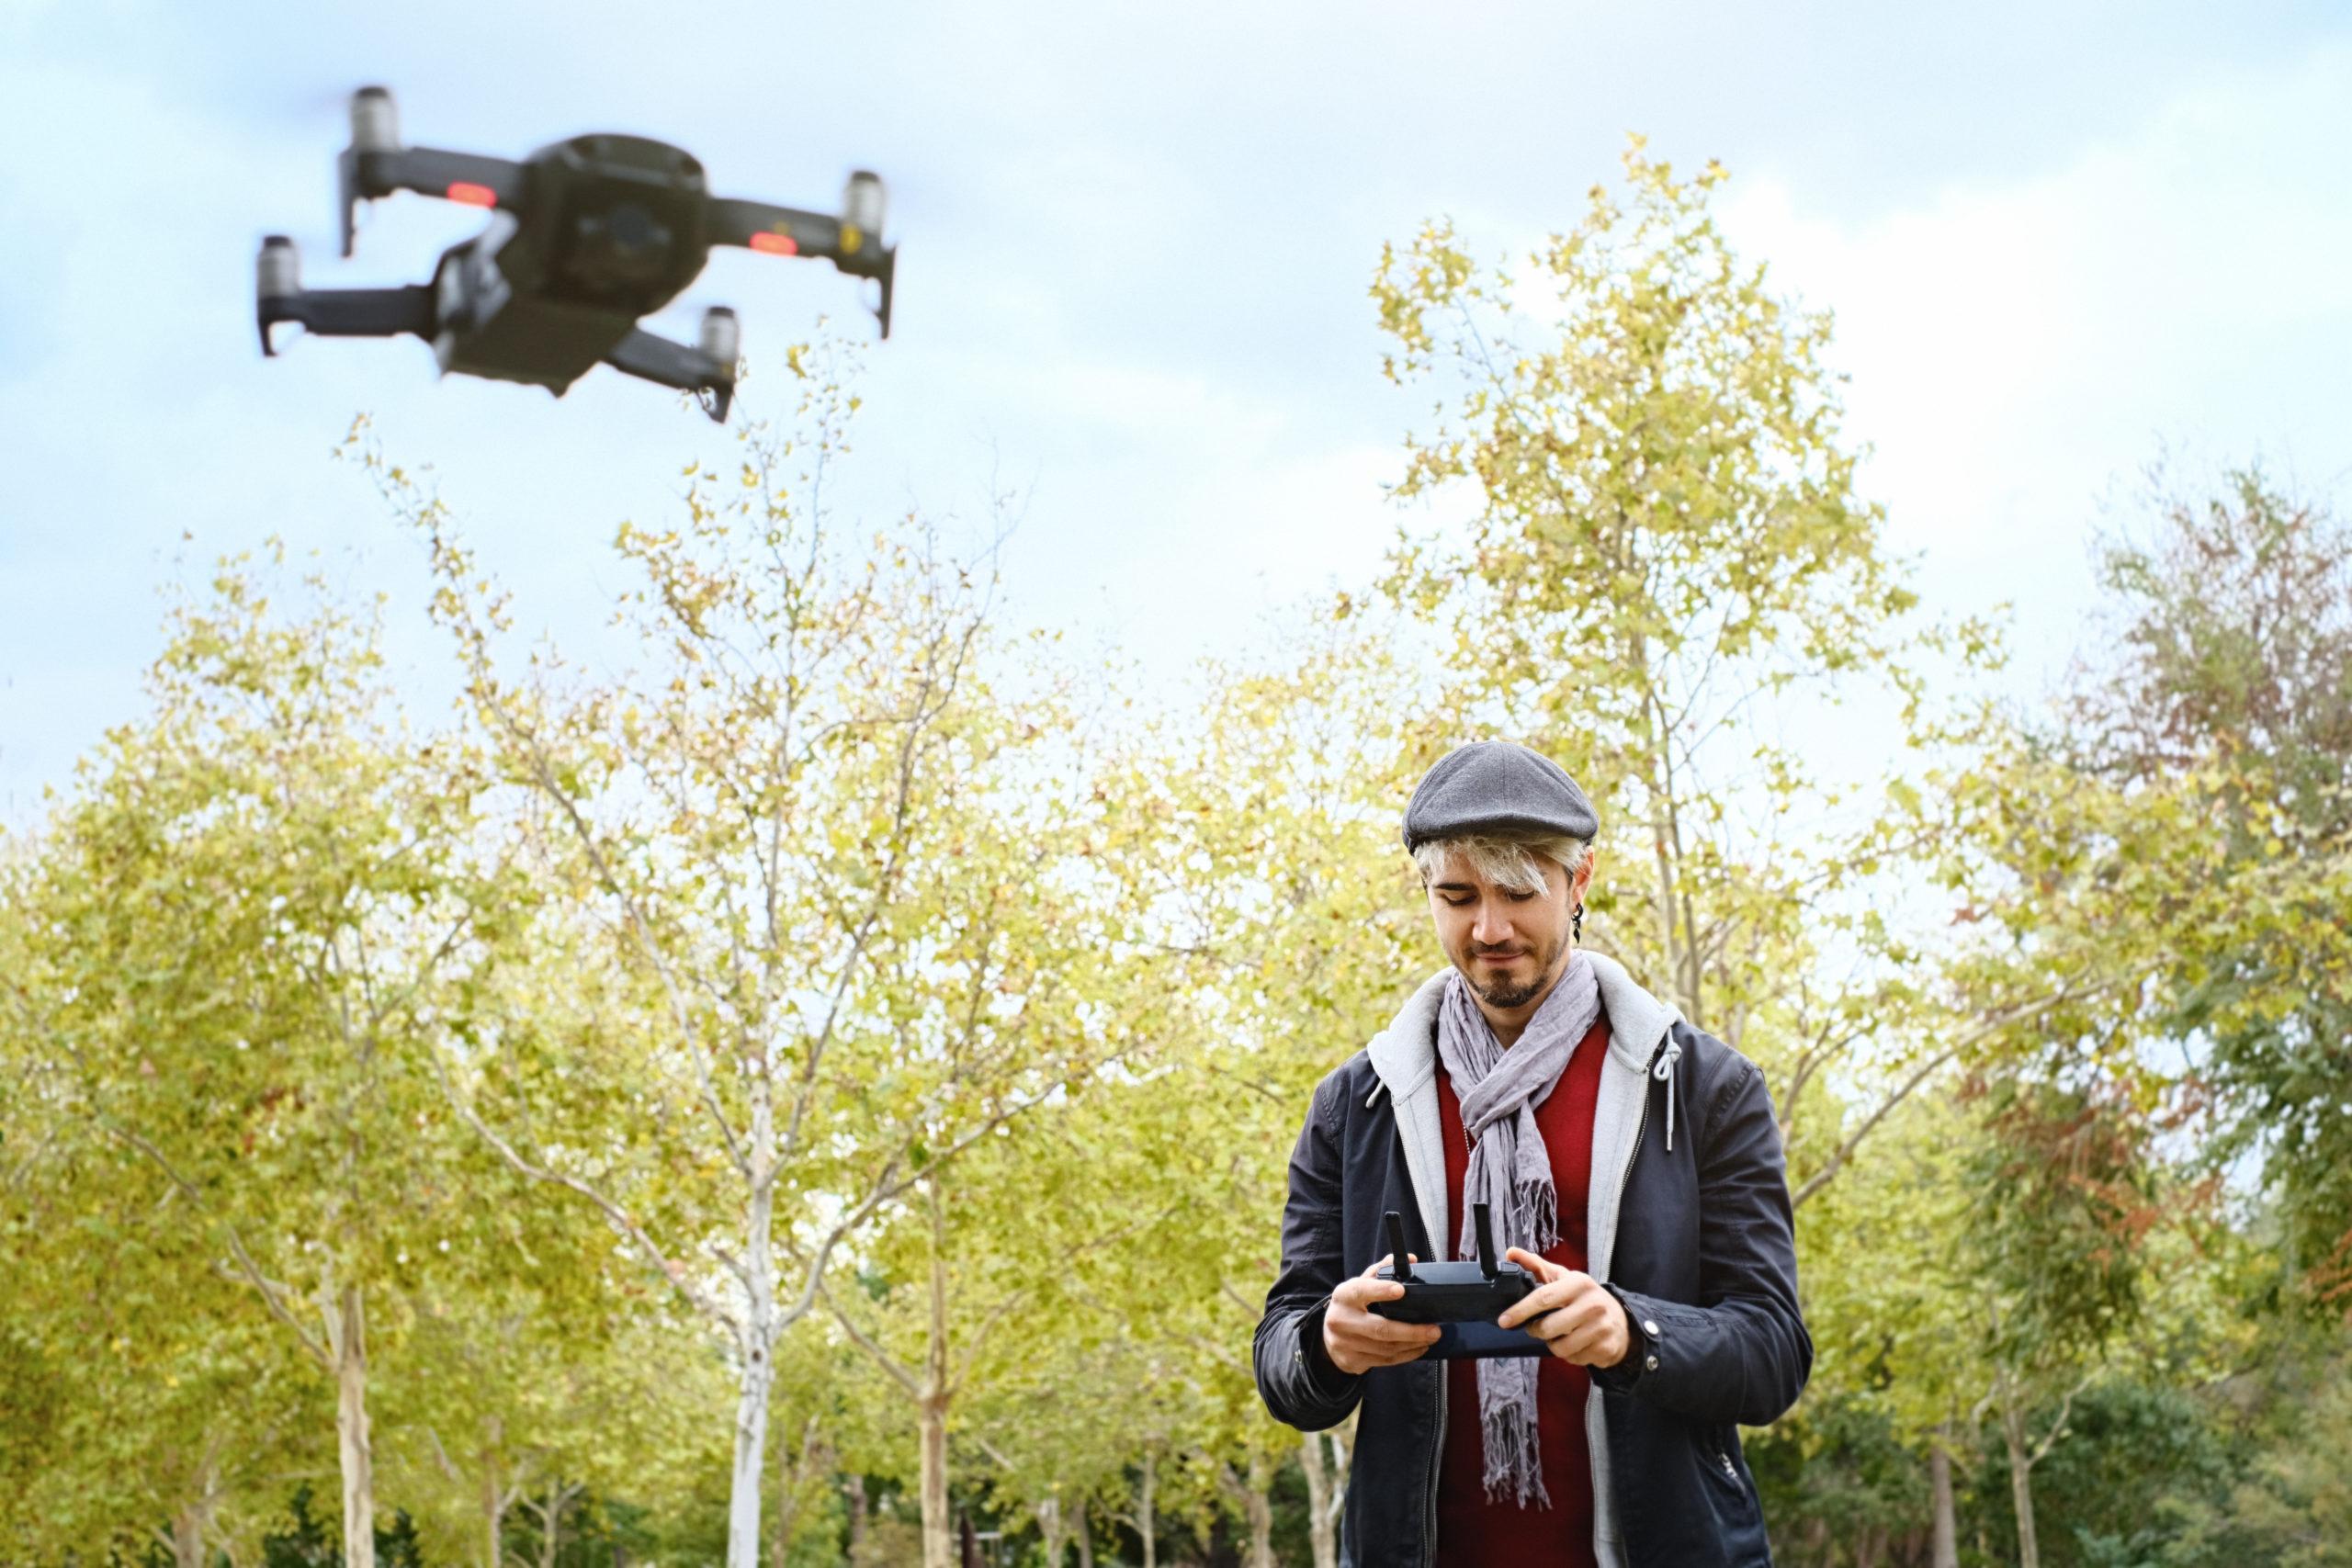 Überwachung dank Drohne mit Minikamera